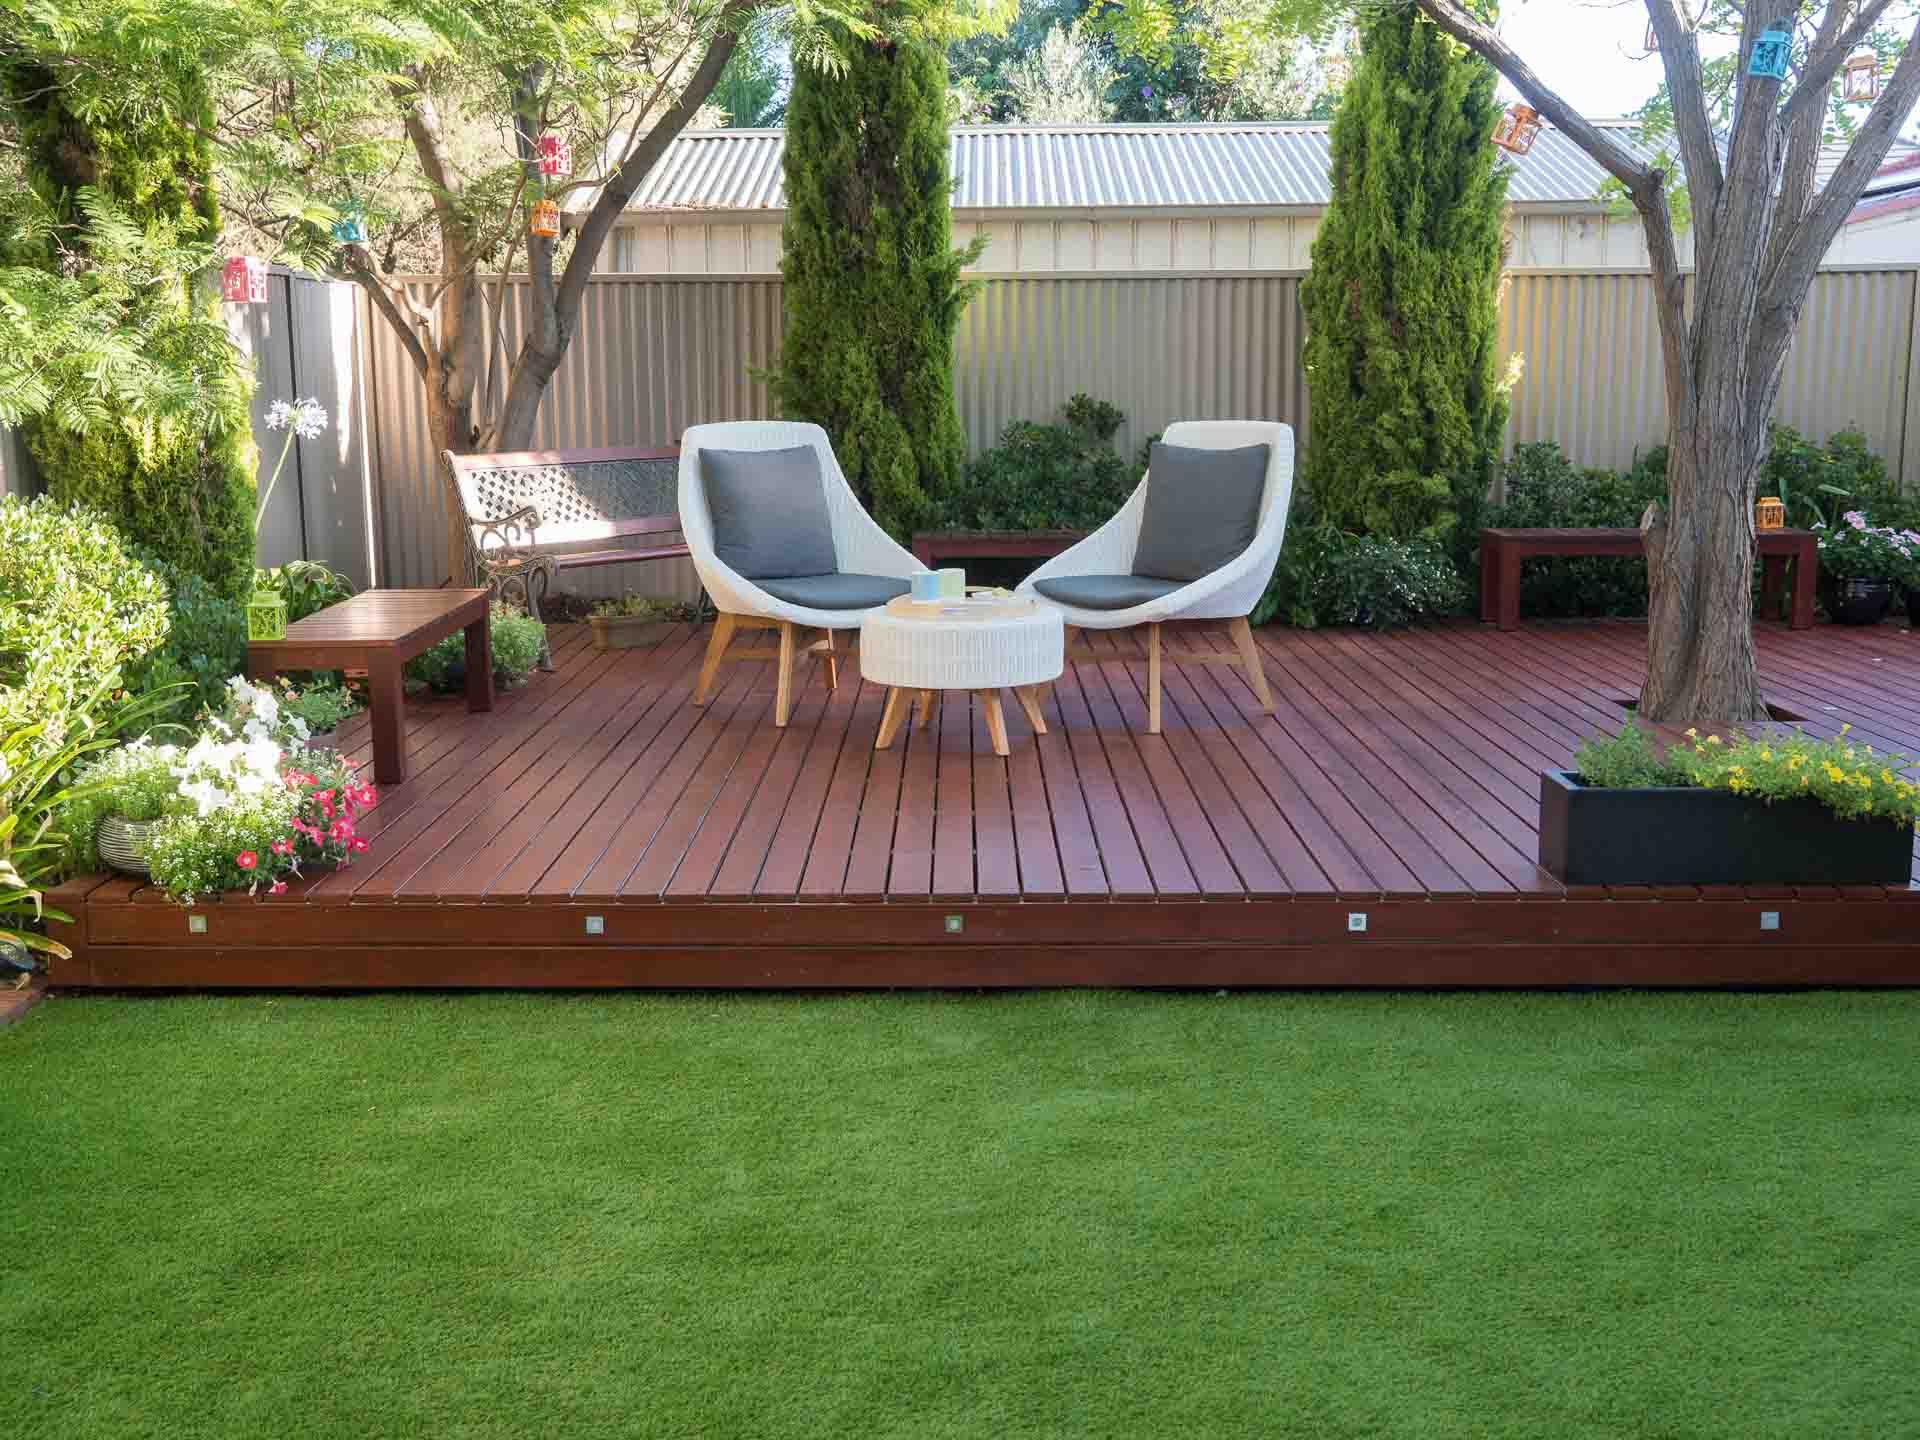 Artificial Grass Lawns - A Good Choice - Why choose Artificial Grass